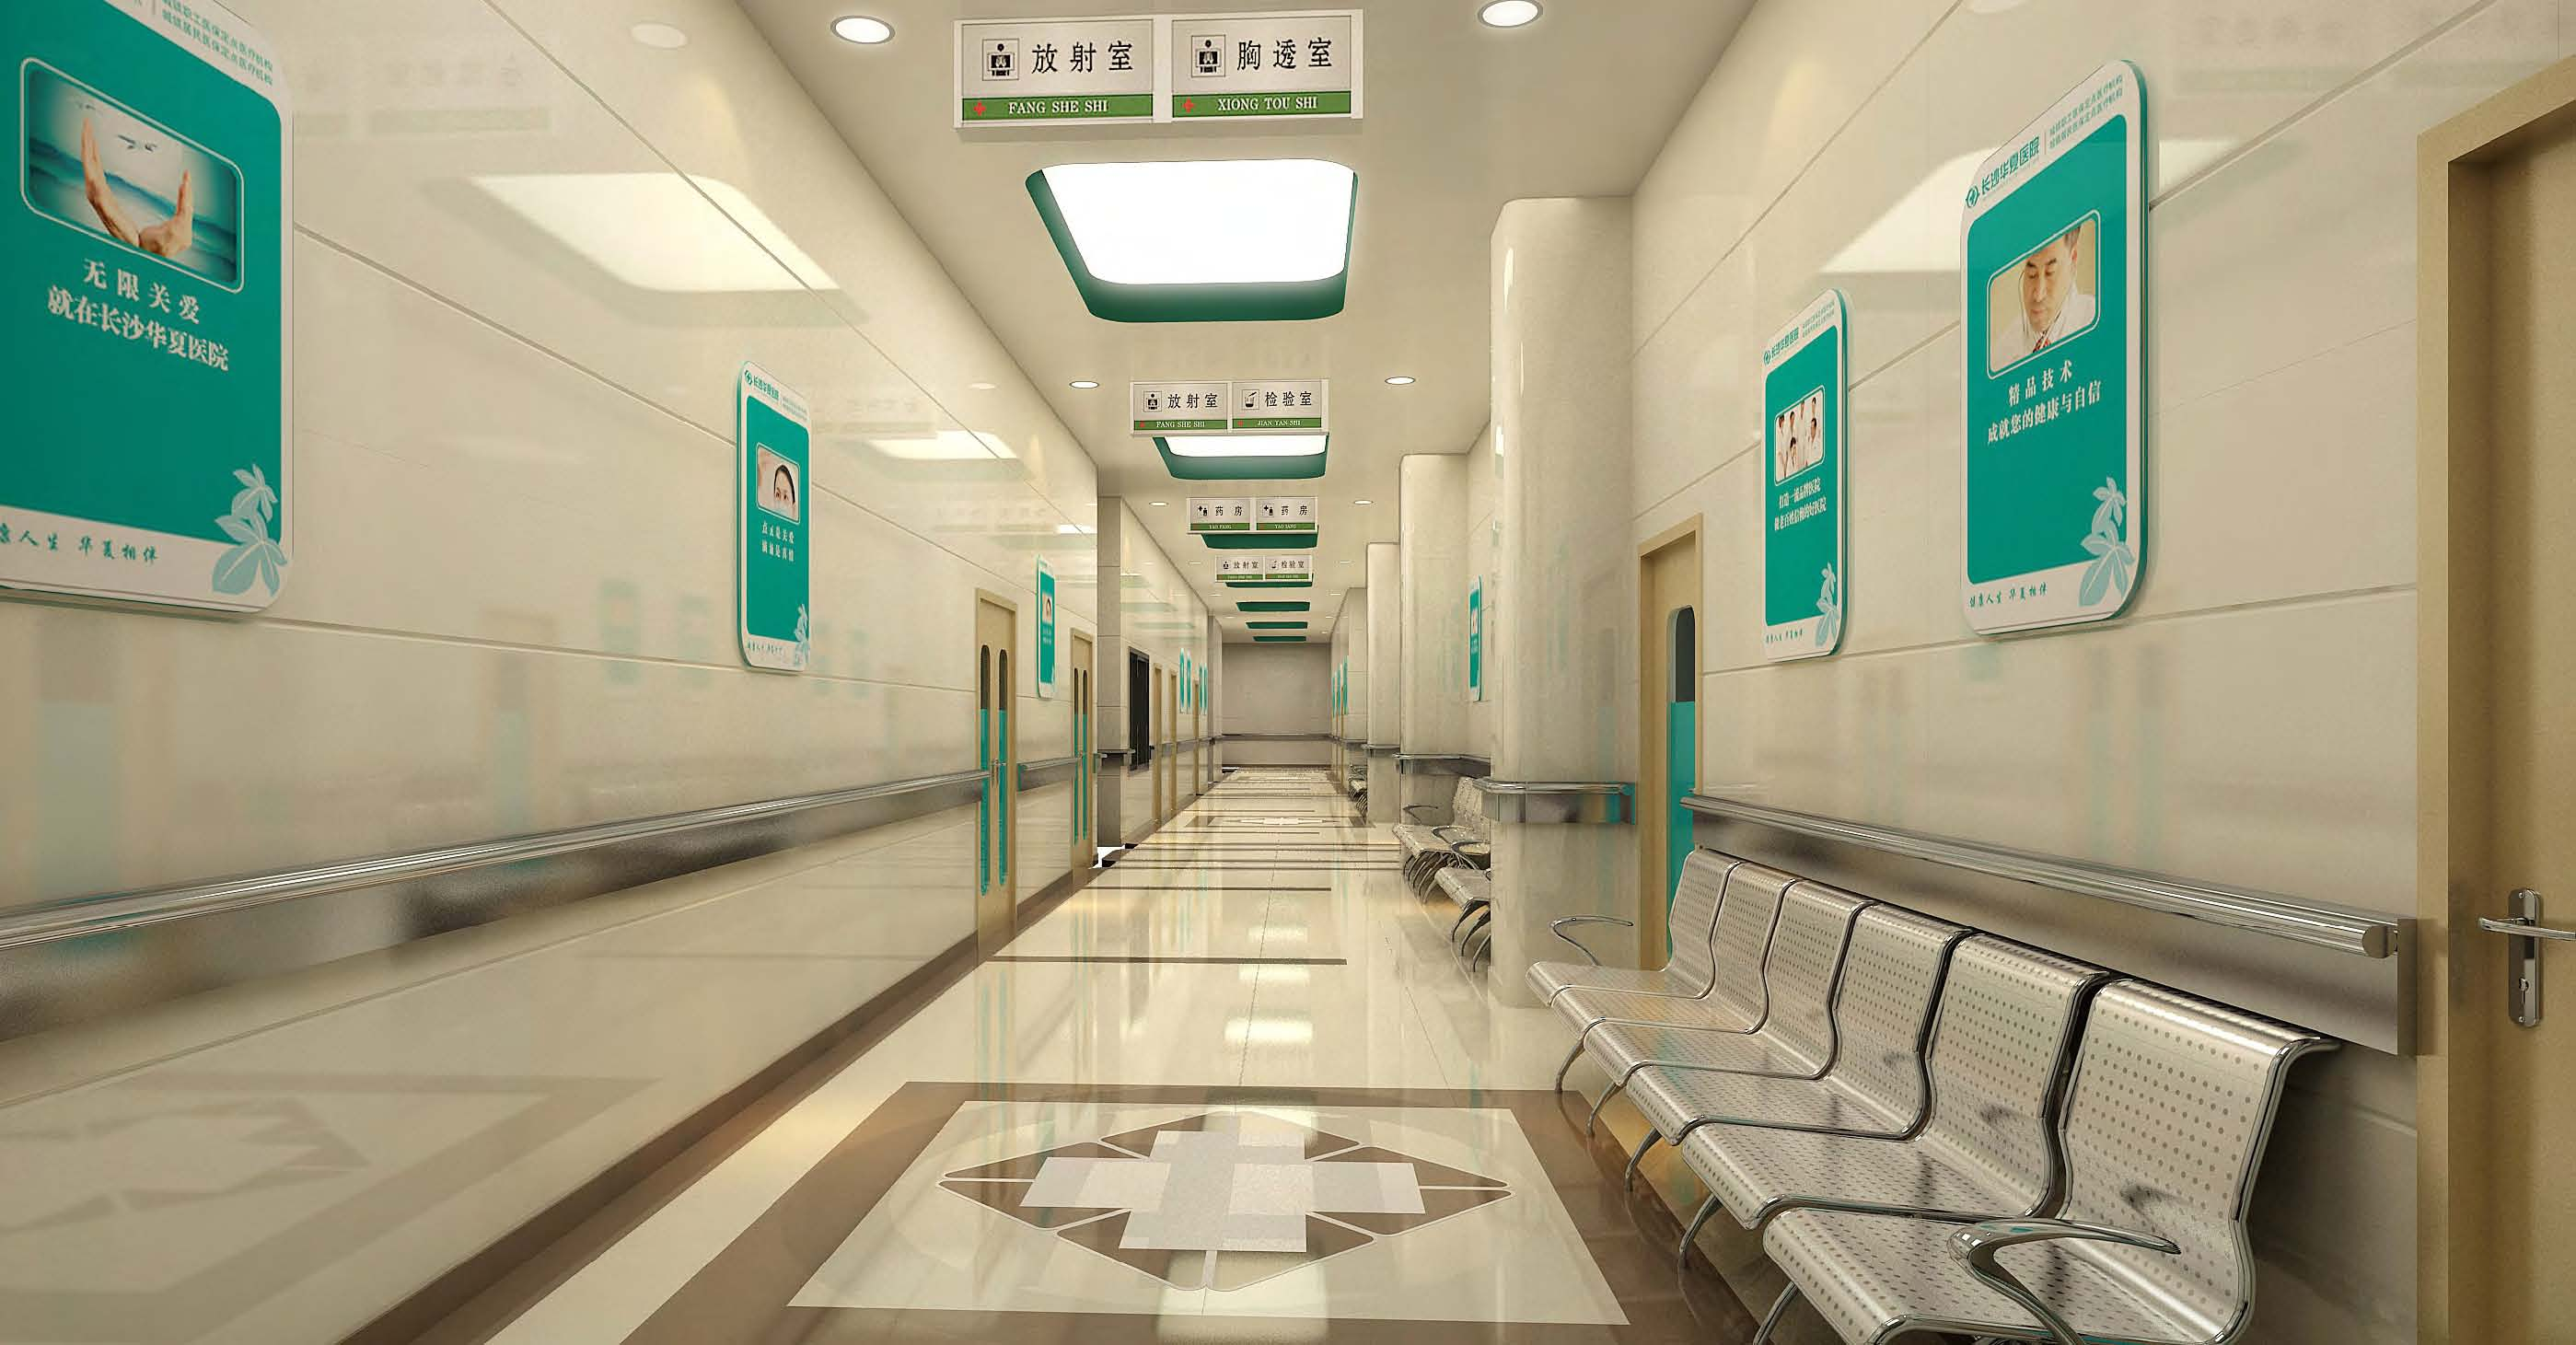 CHANGSHA HUAXIA HOSPITAL